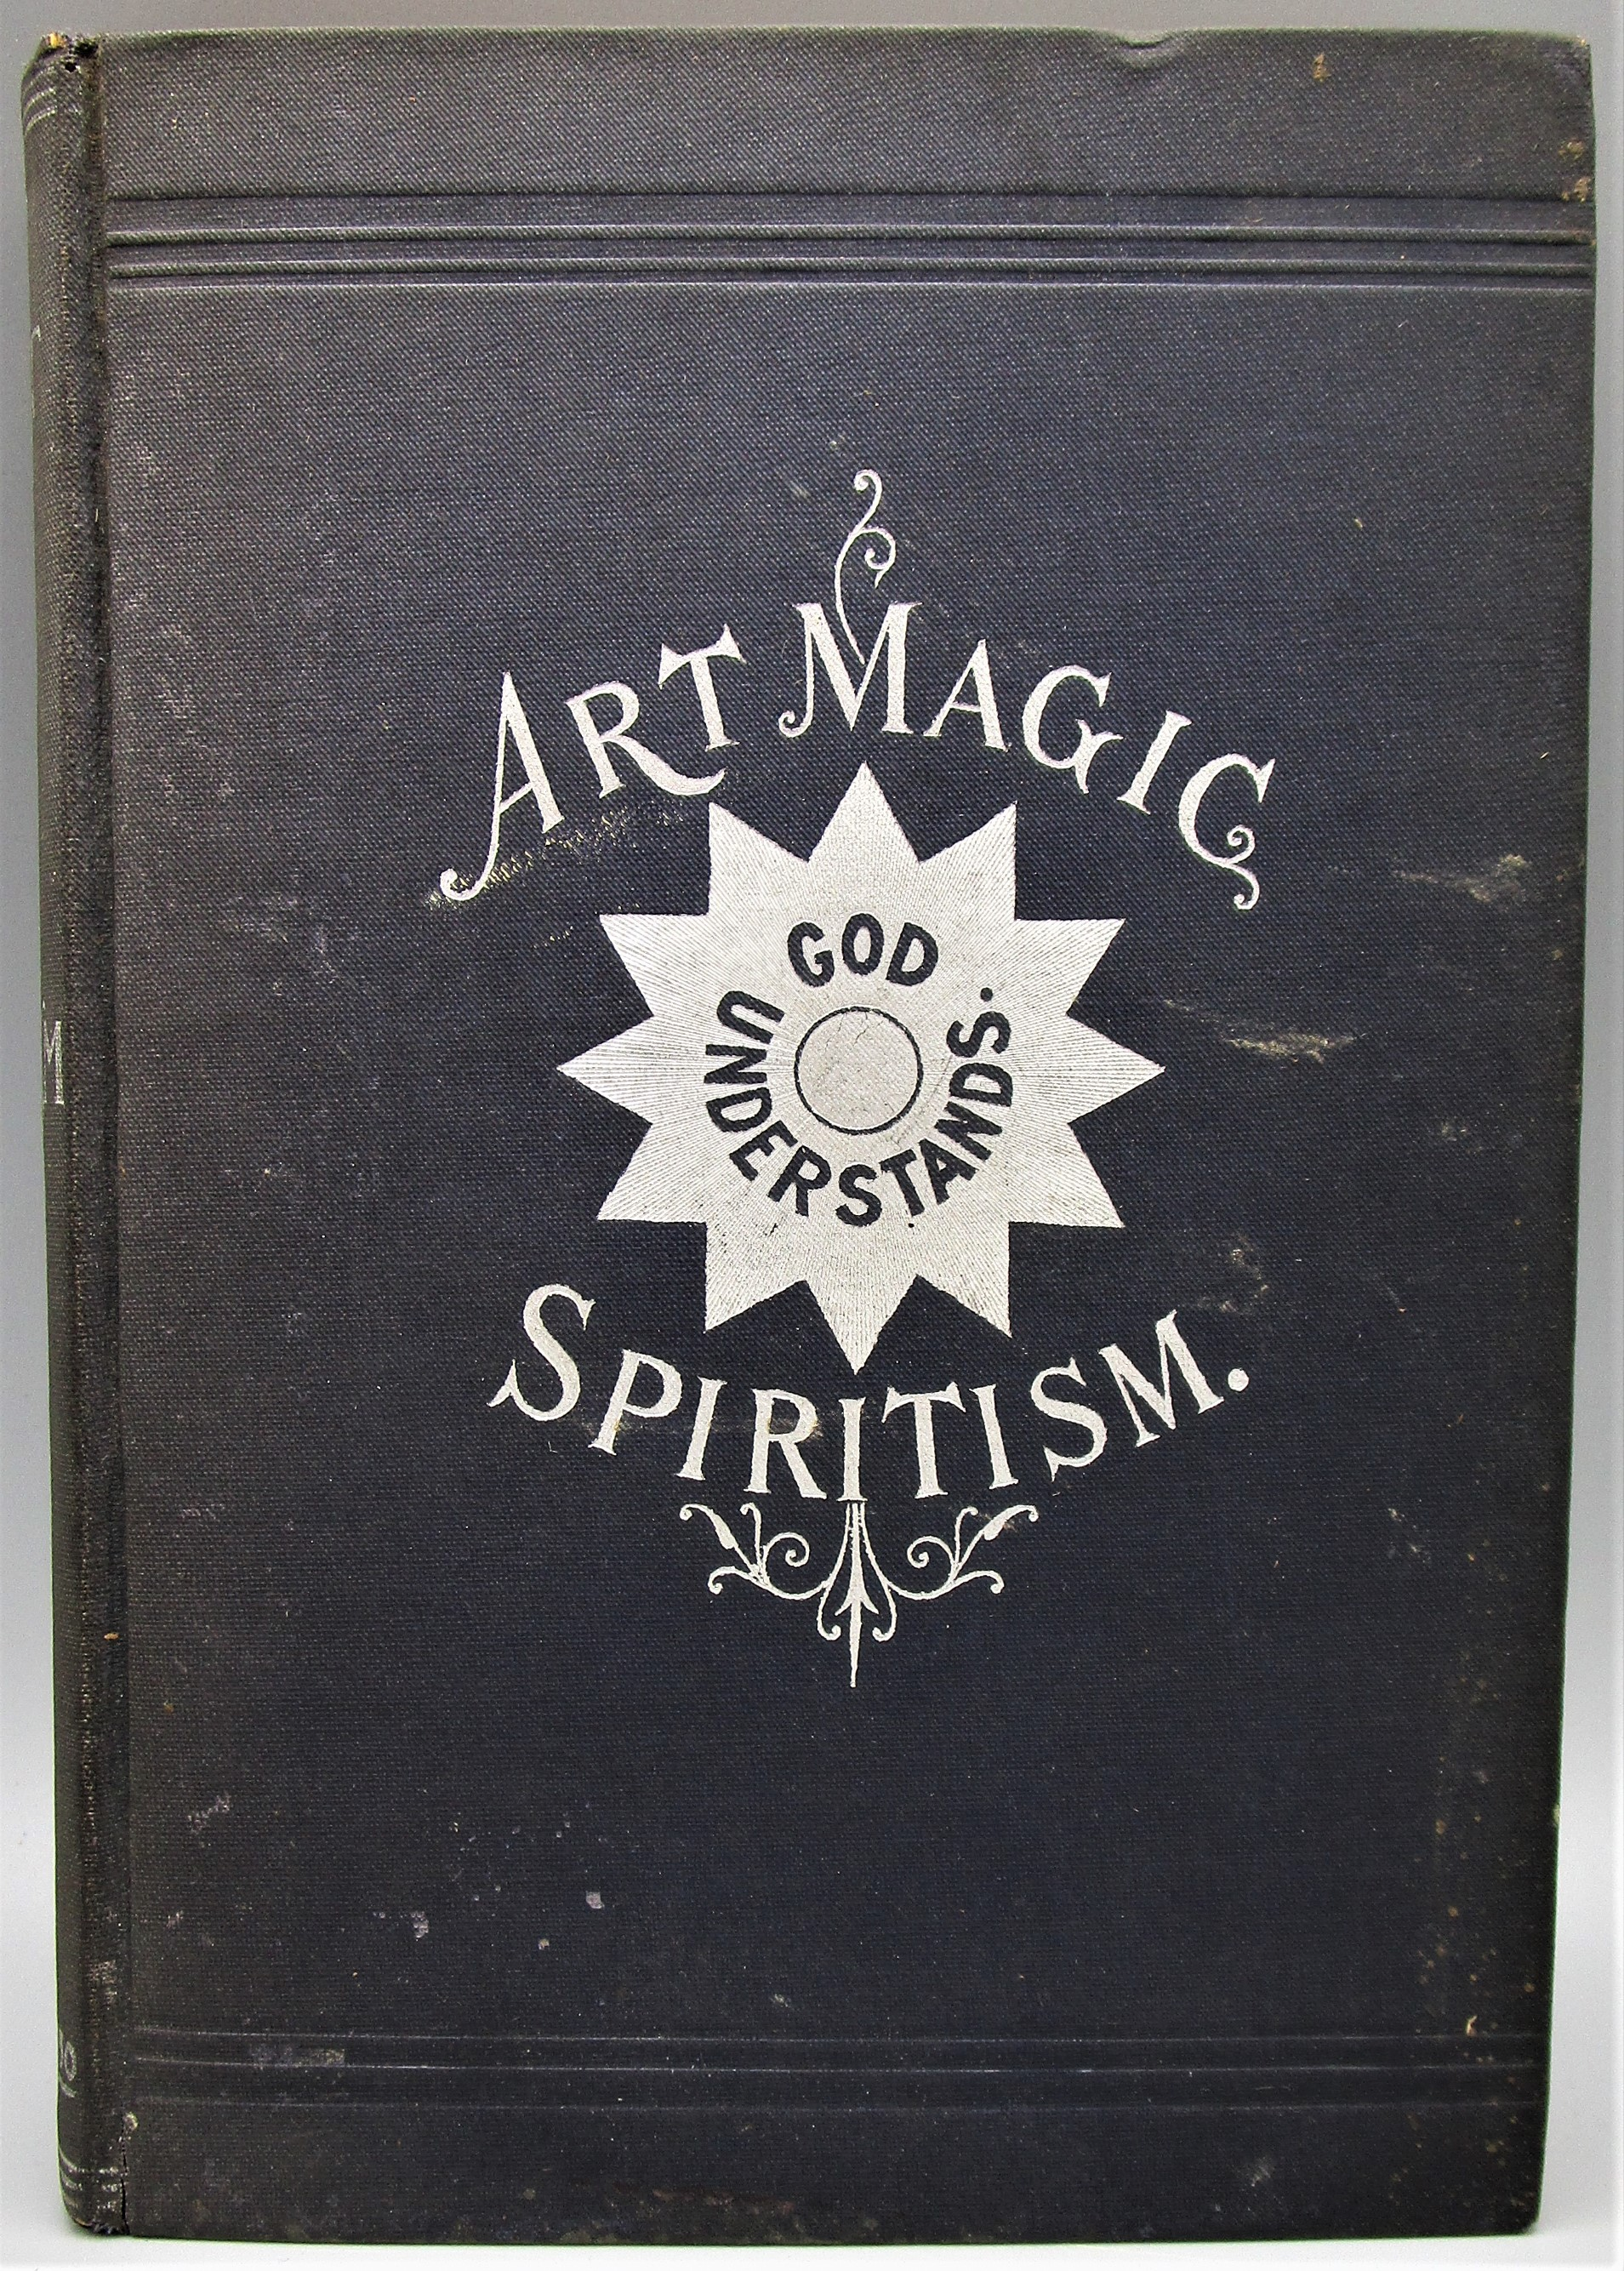 ART MAGIC, OR MUNDANE, SUB-MUNDANE AND SUPER-MUNDANE SPIRITISM, by William Britten - 1909